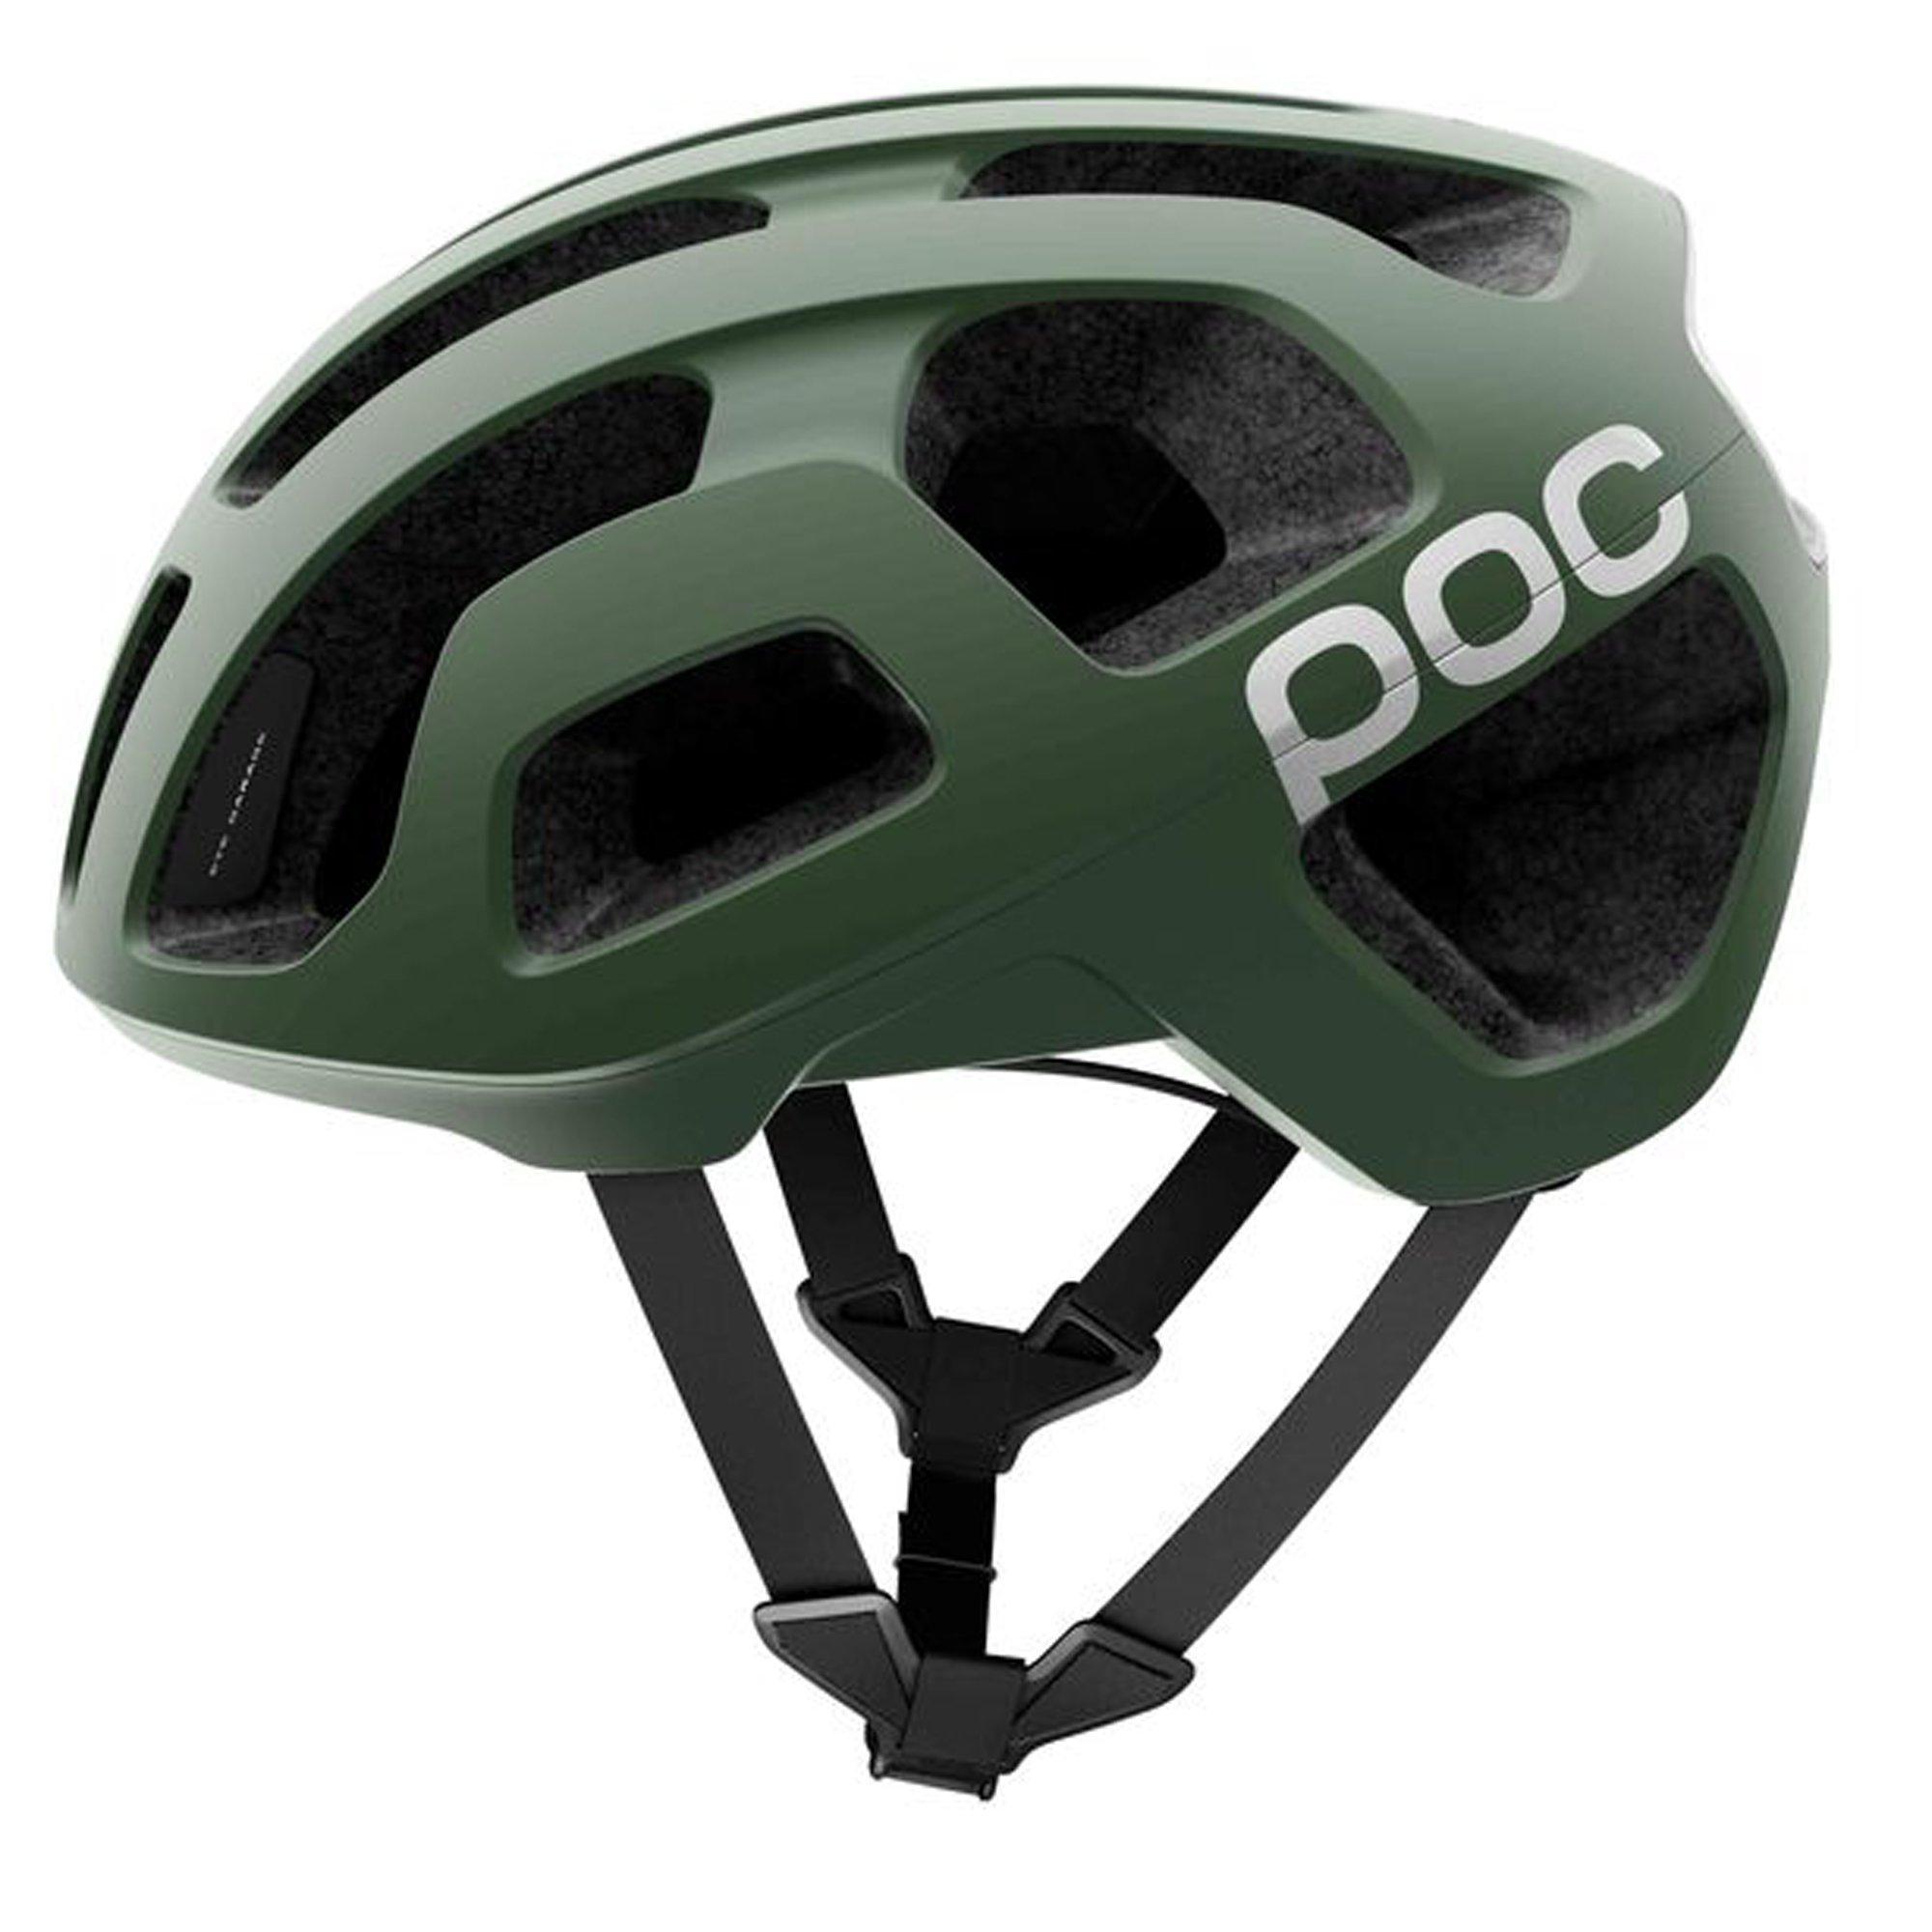 POC Octal, Helmet for Road Biking, Hydrogen, Septane Green, M